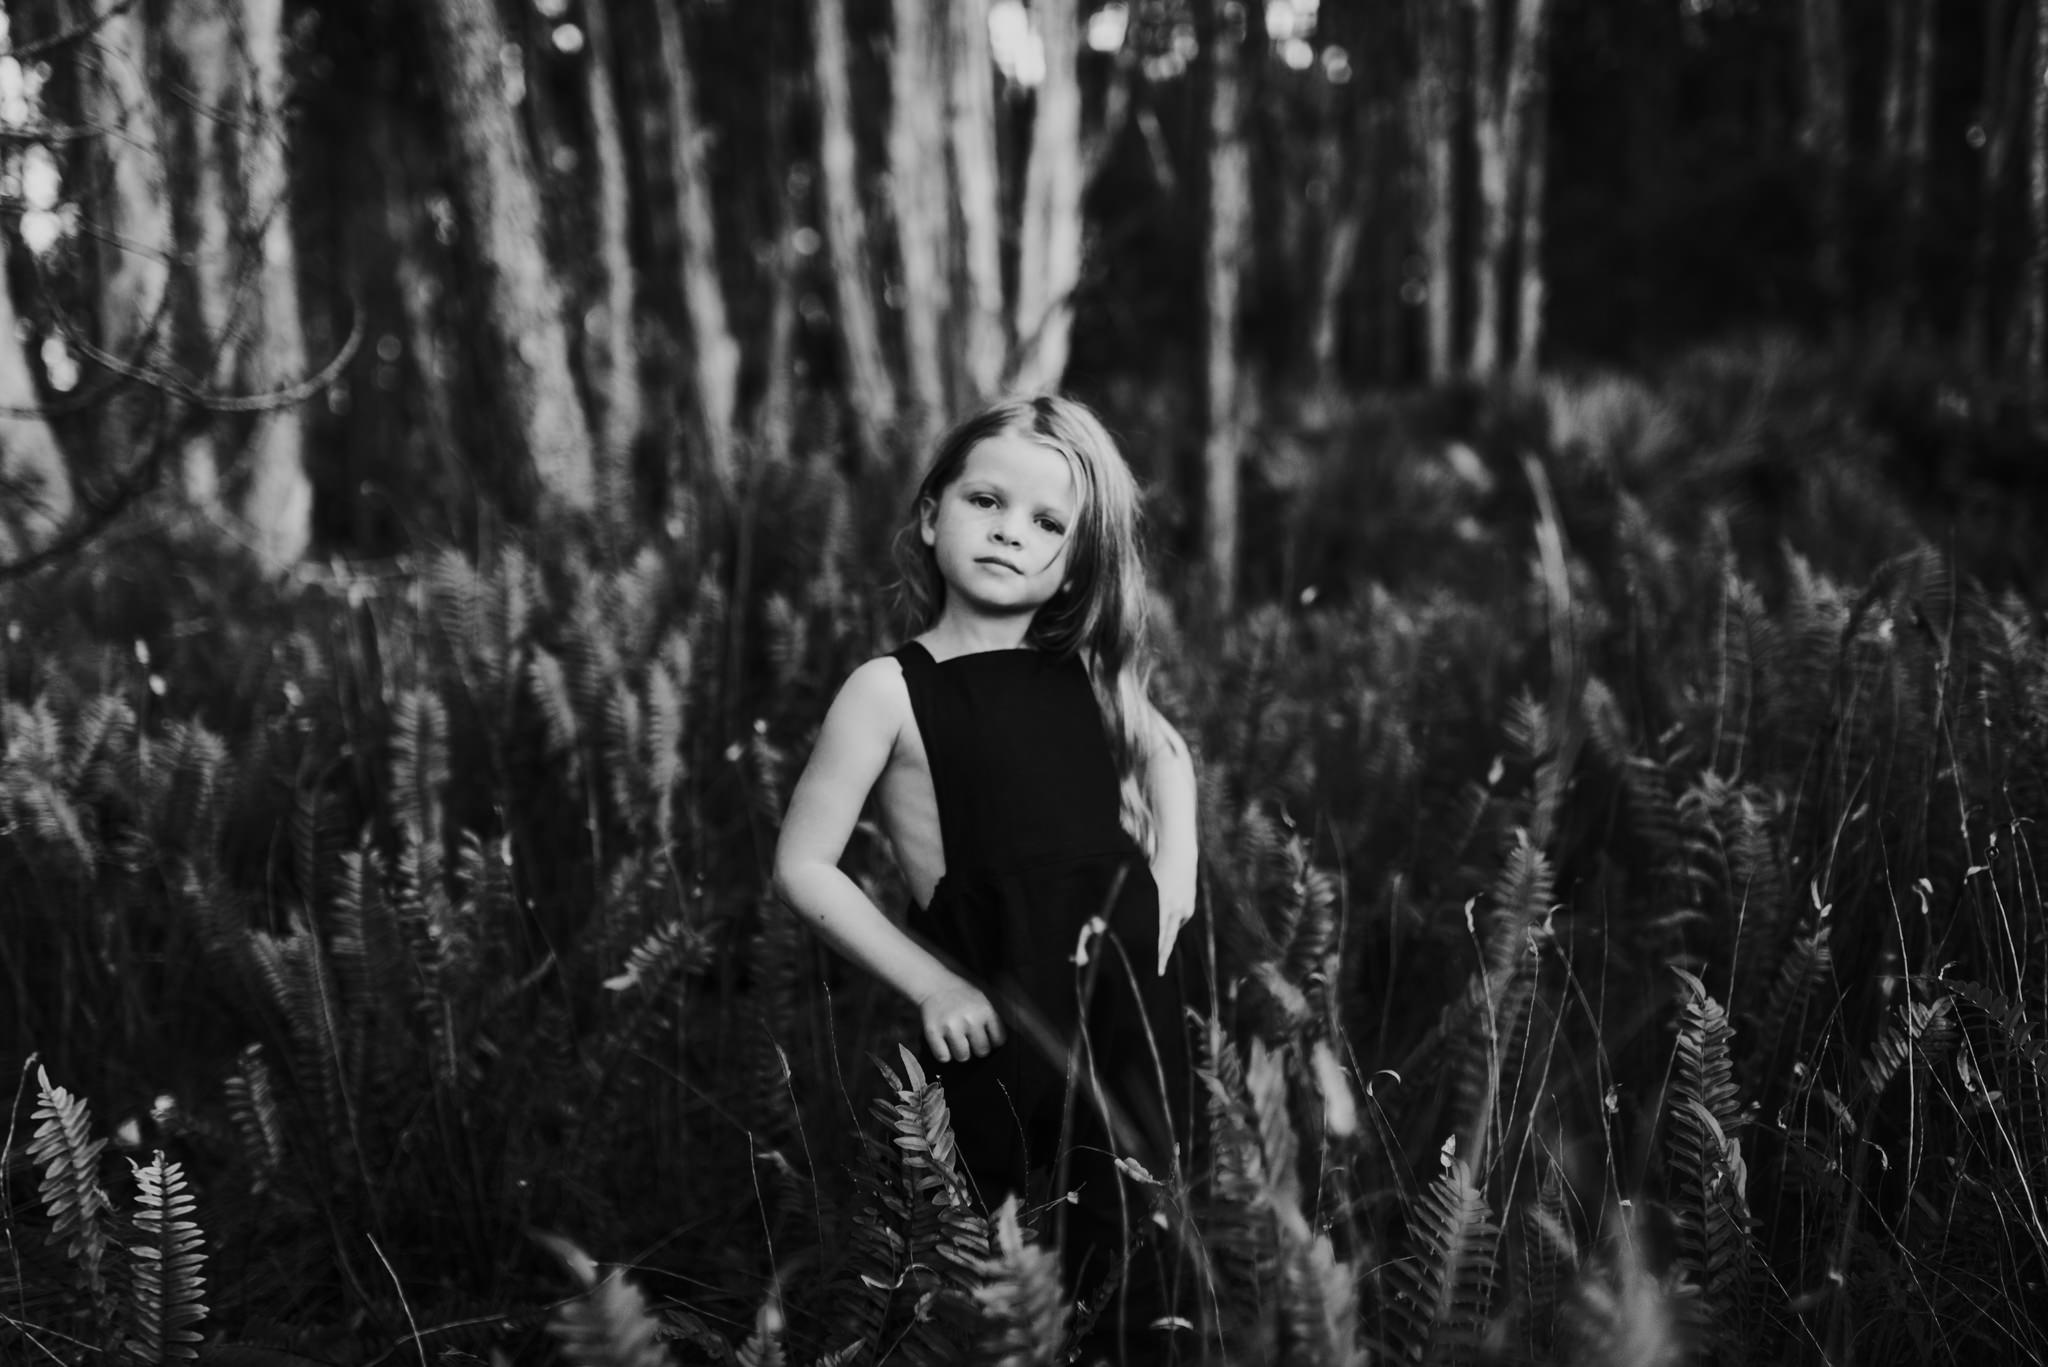 twyla jones photography - treasure coast florida - childrens adventure clothing commercial shoot--49.jpg